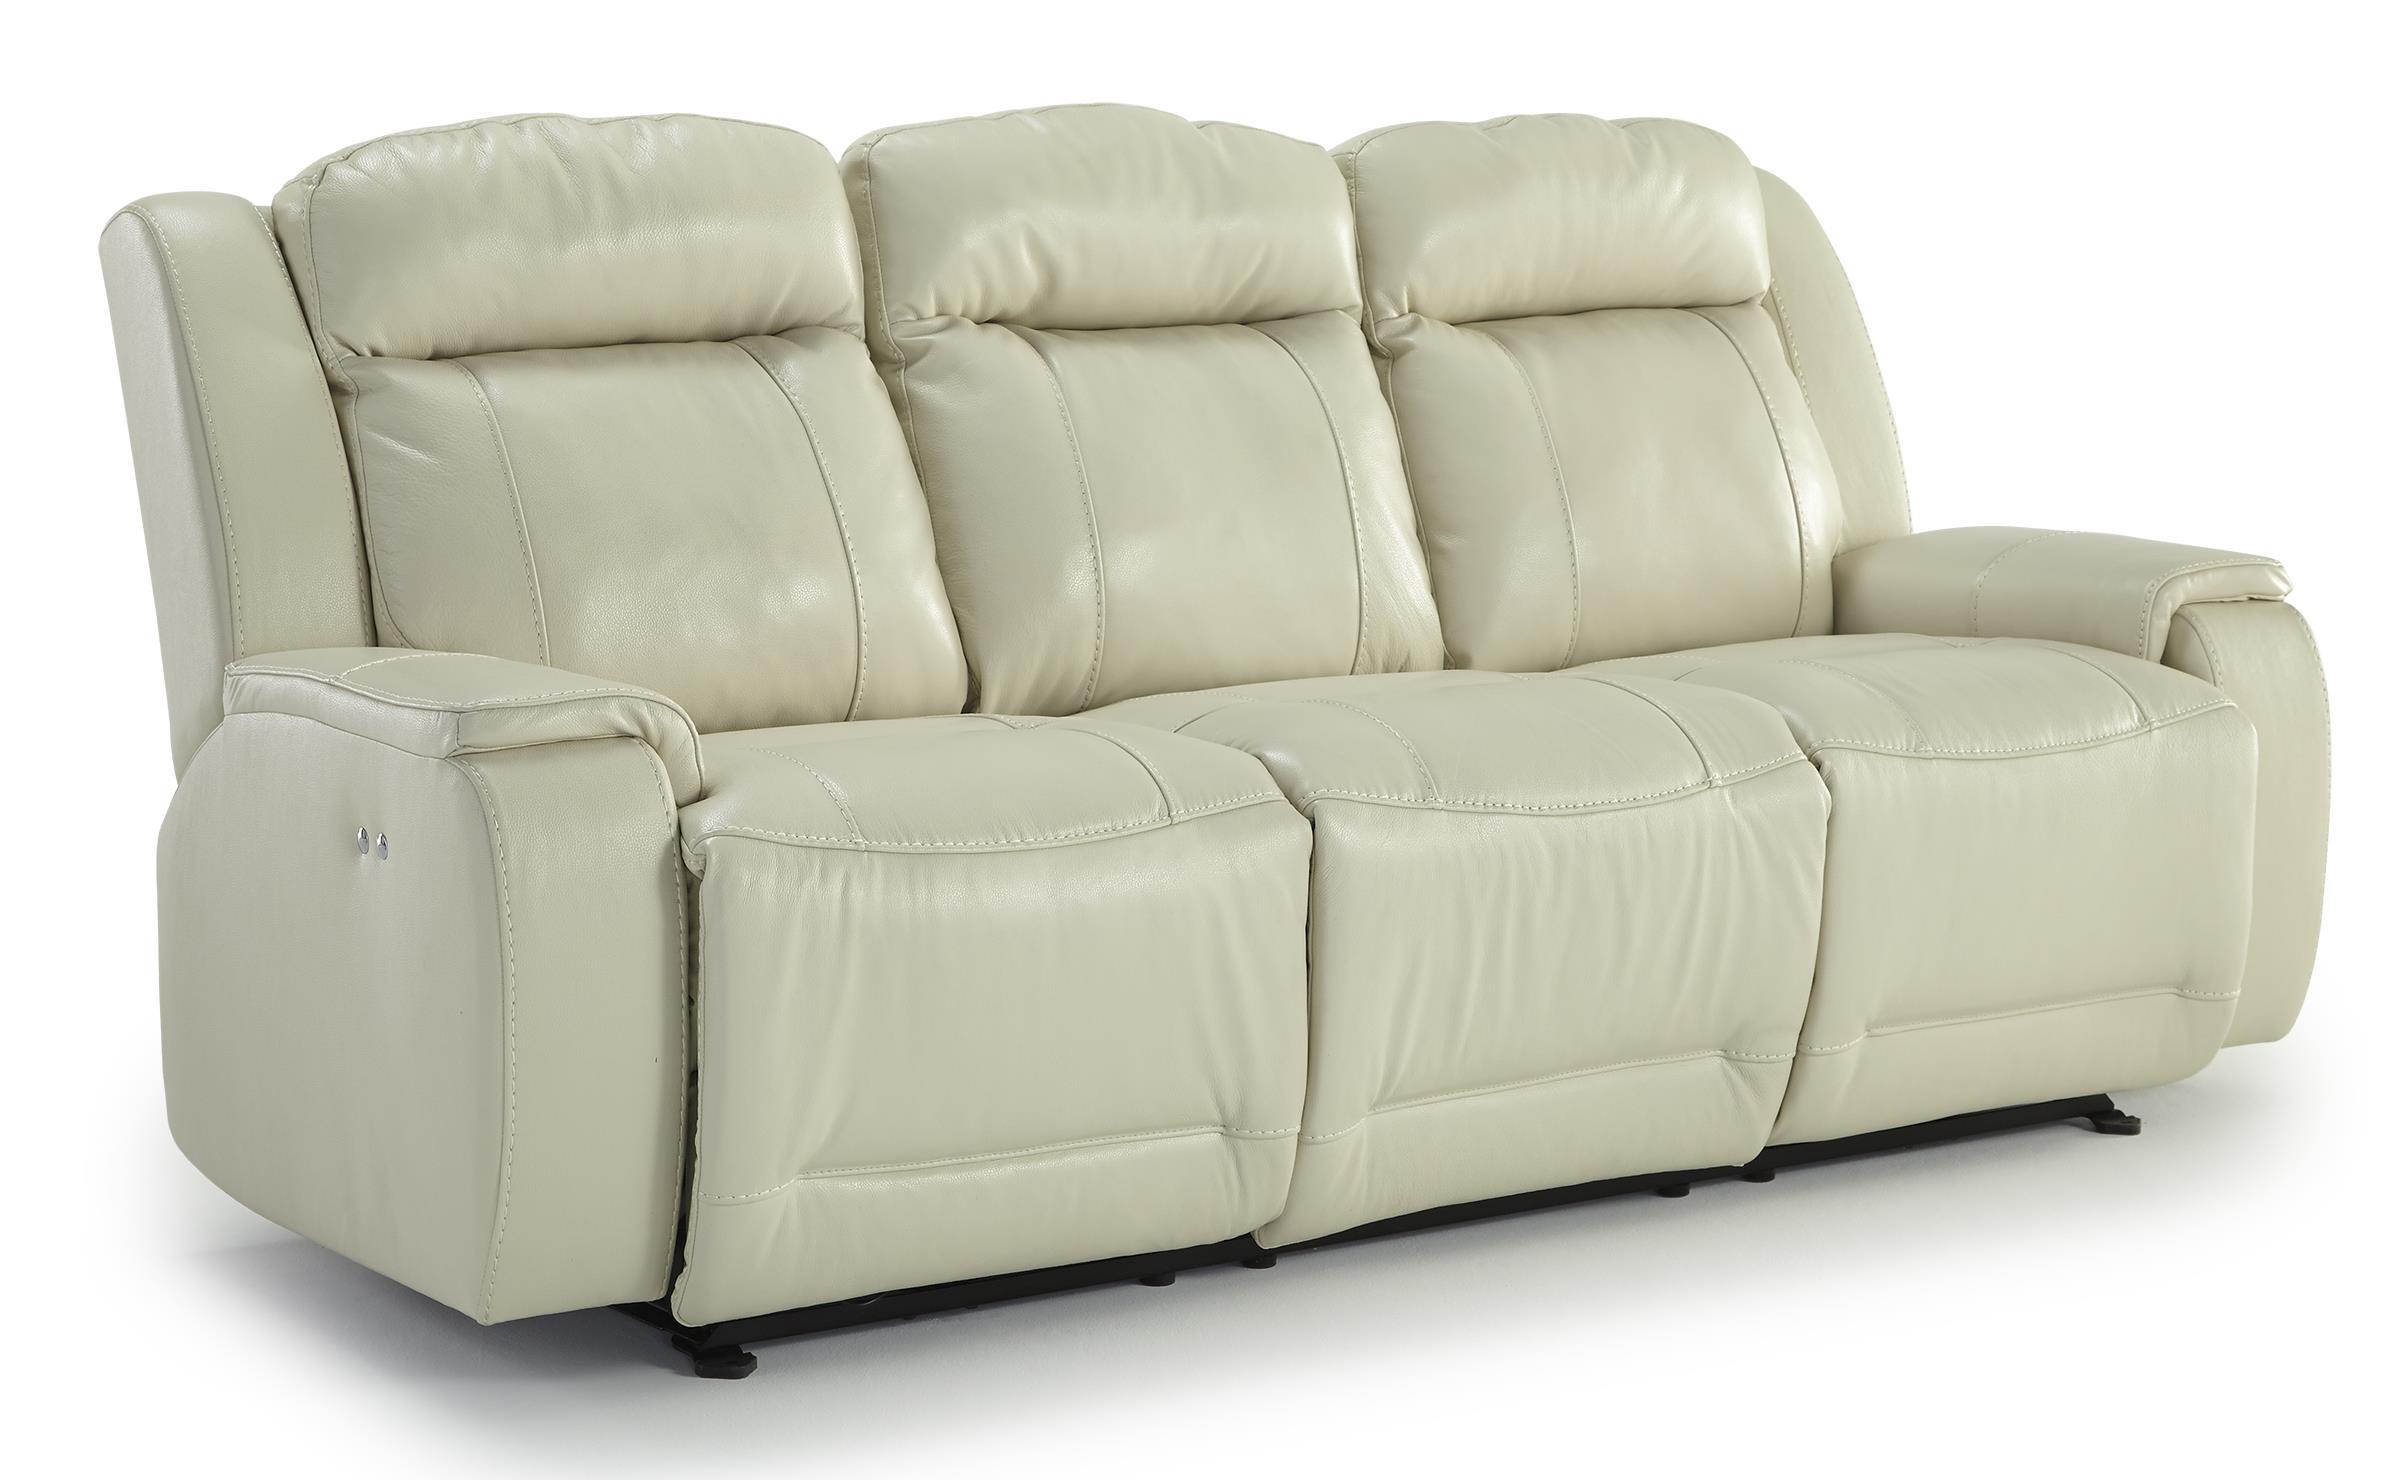 Charmant Best Home Furnishings HardistyPower Reclining Sofa